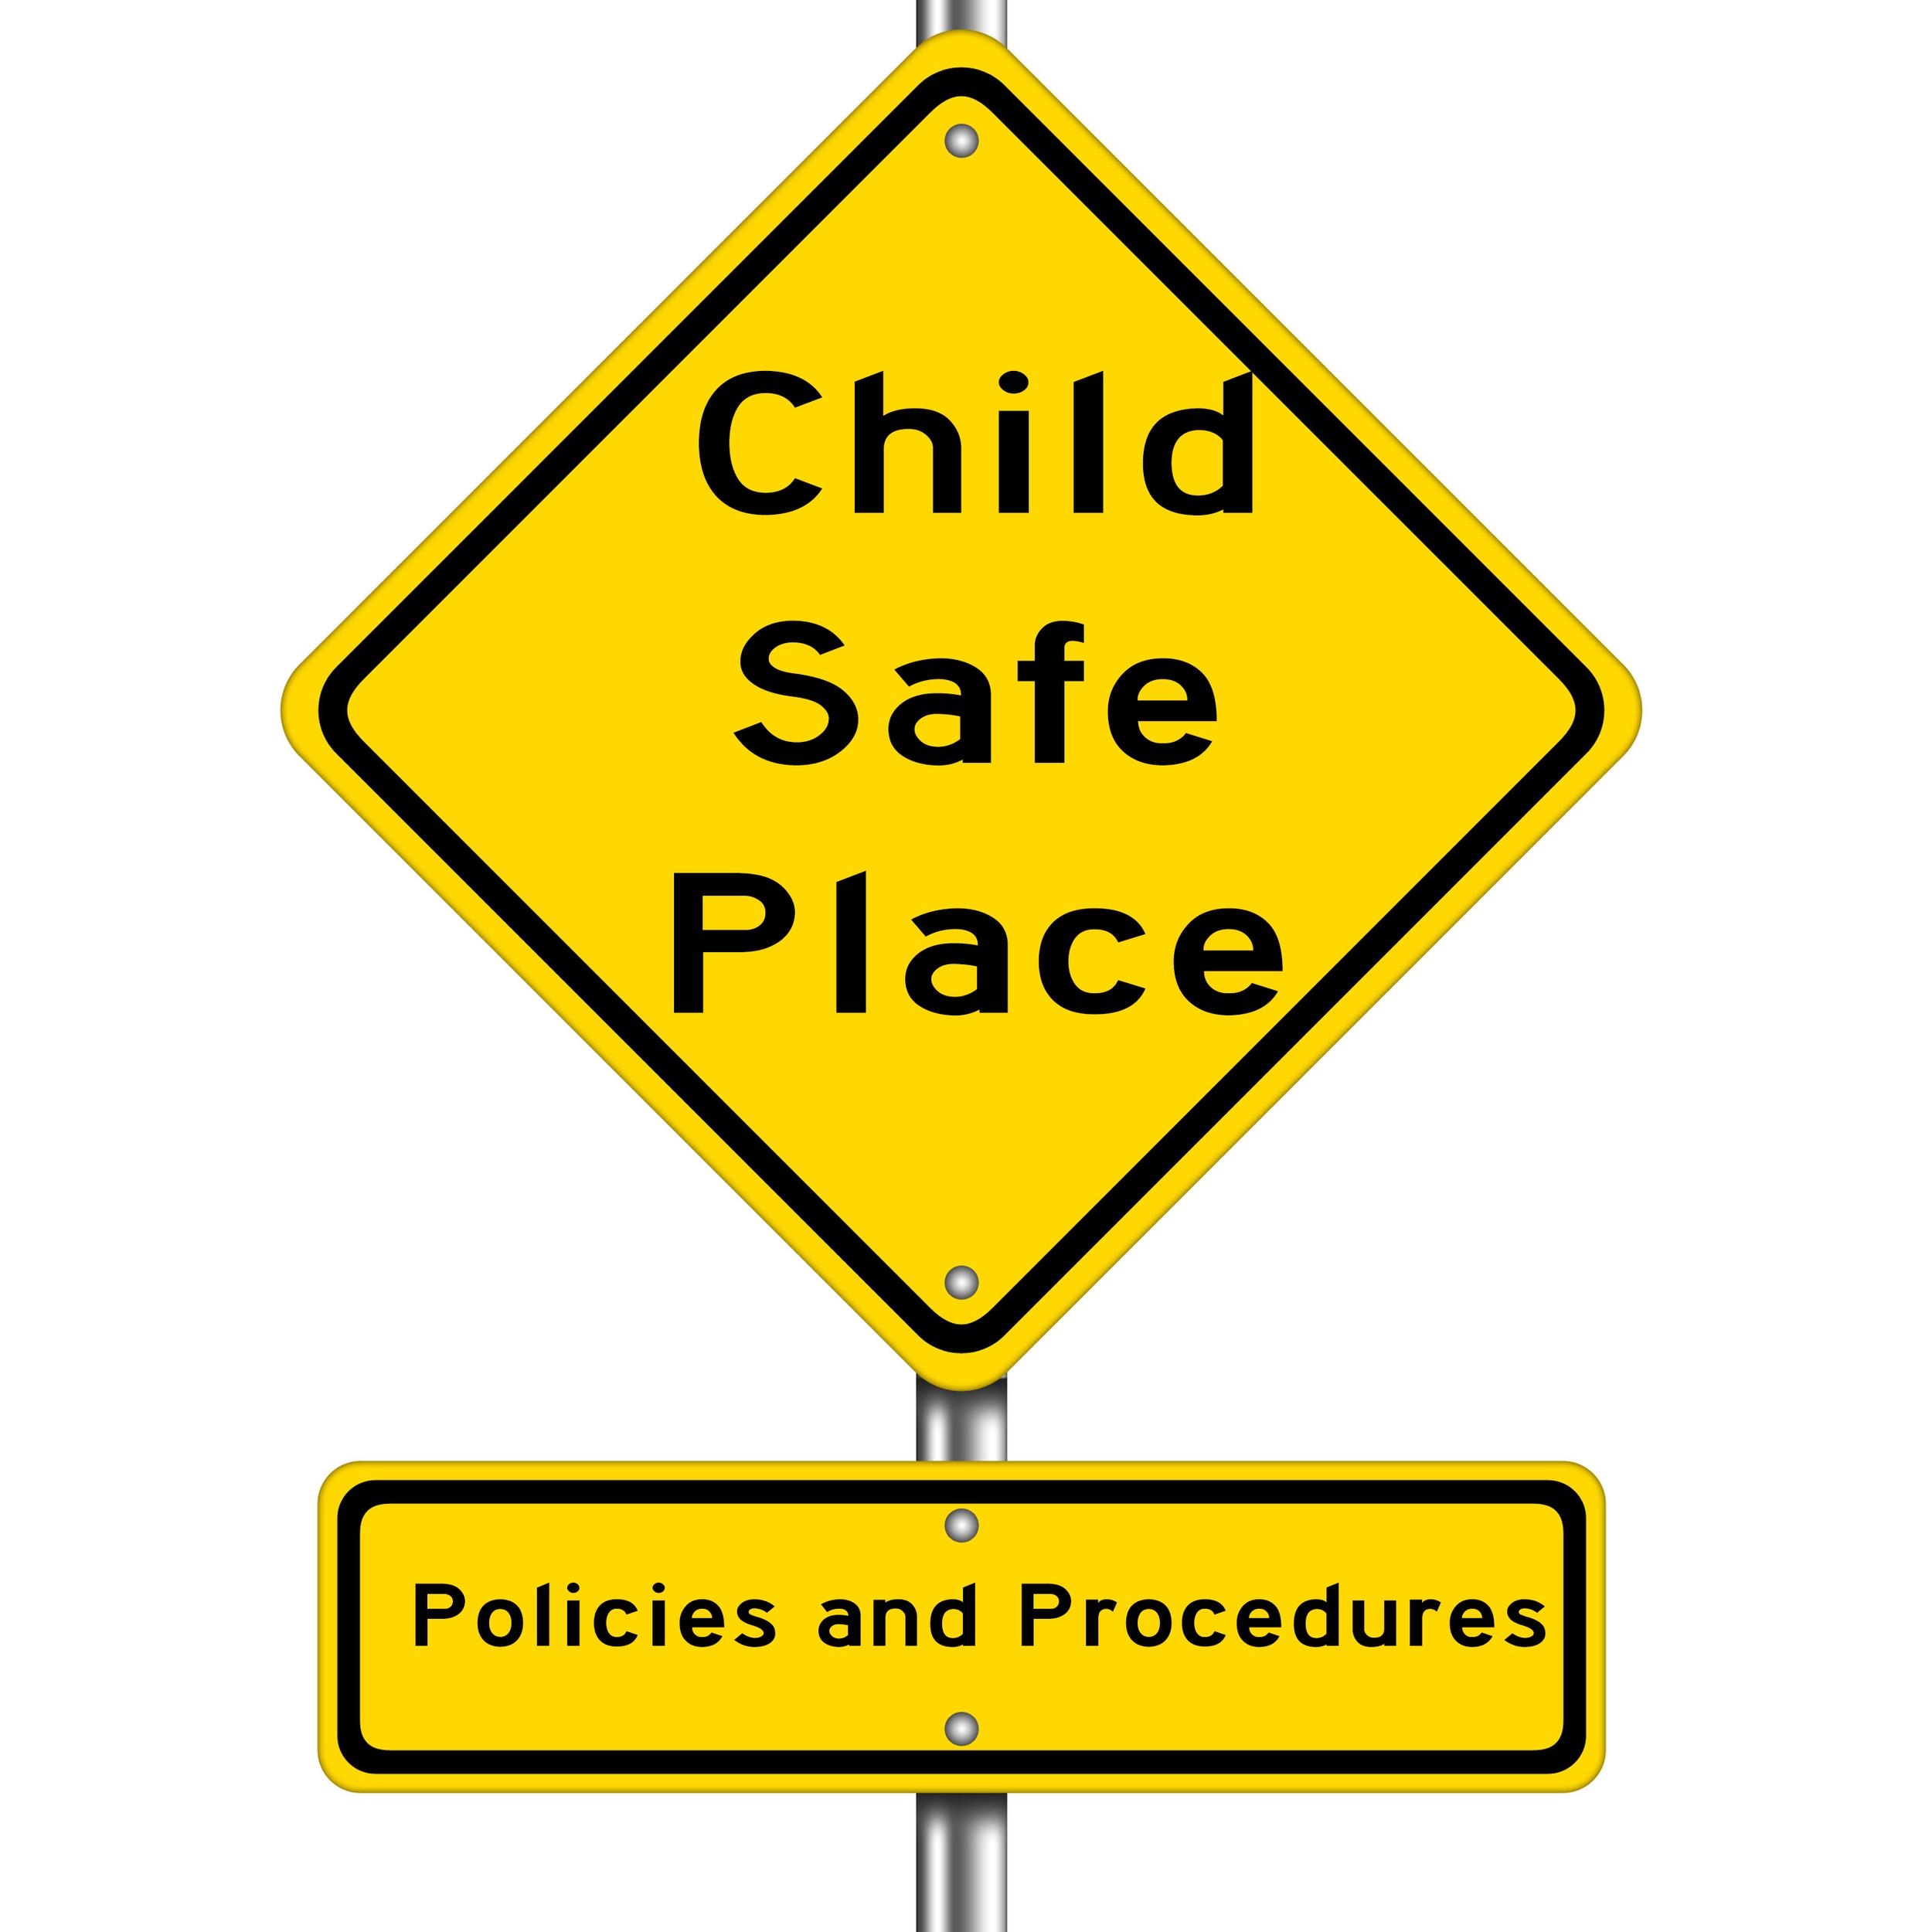 ChildSafePlace.jpg